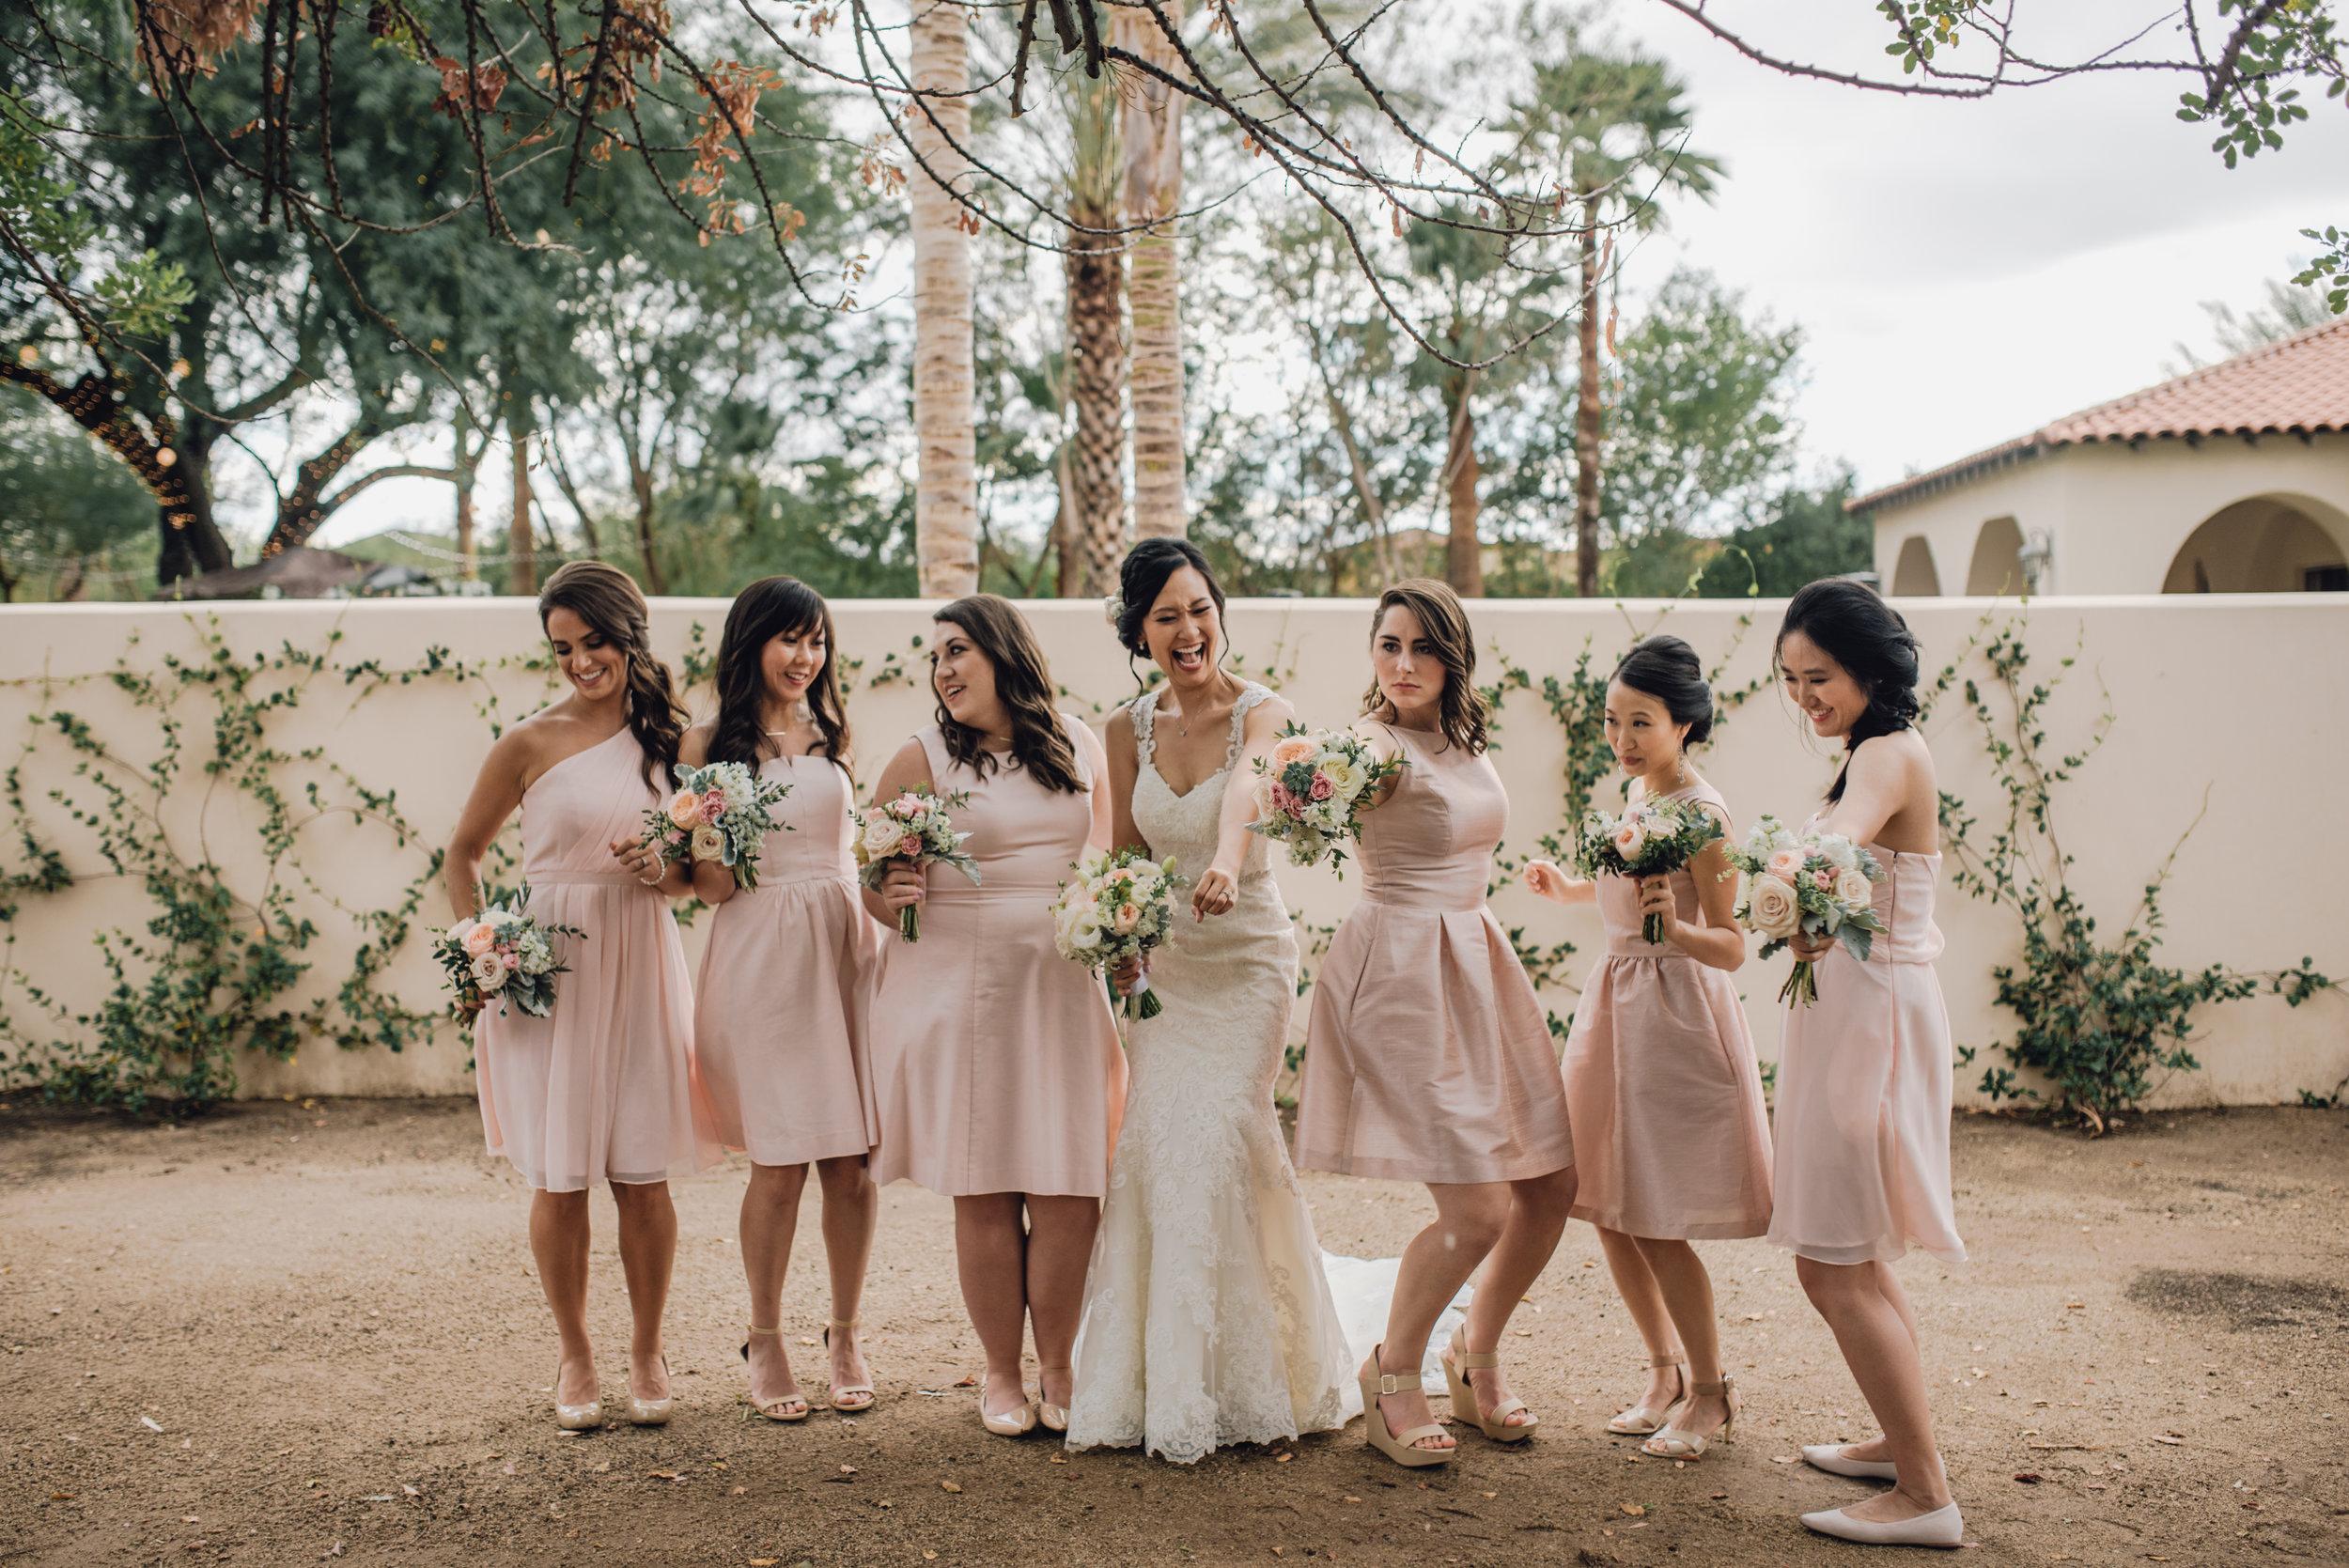 Main and Simple Photography_2016_Wedding_AZ_J+S_BLOG-69.jpg